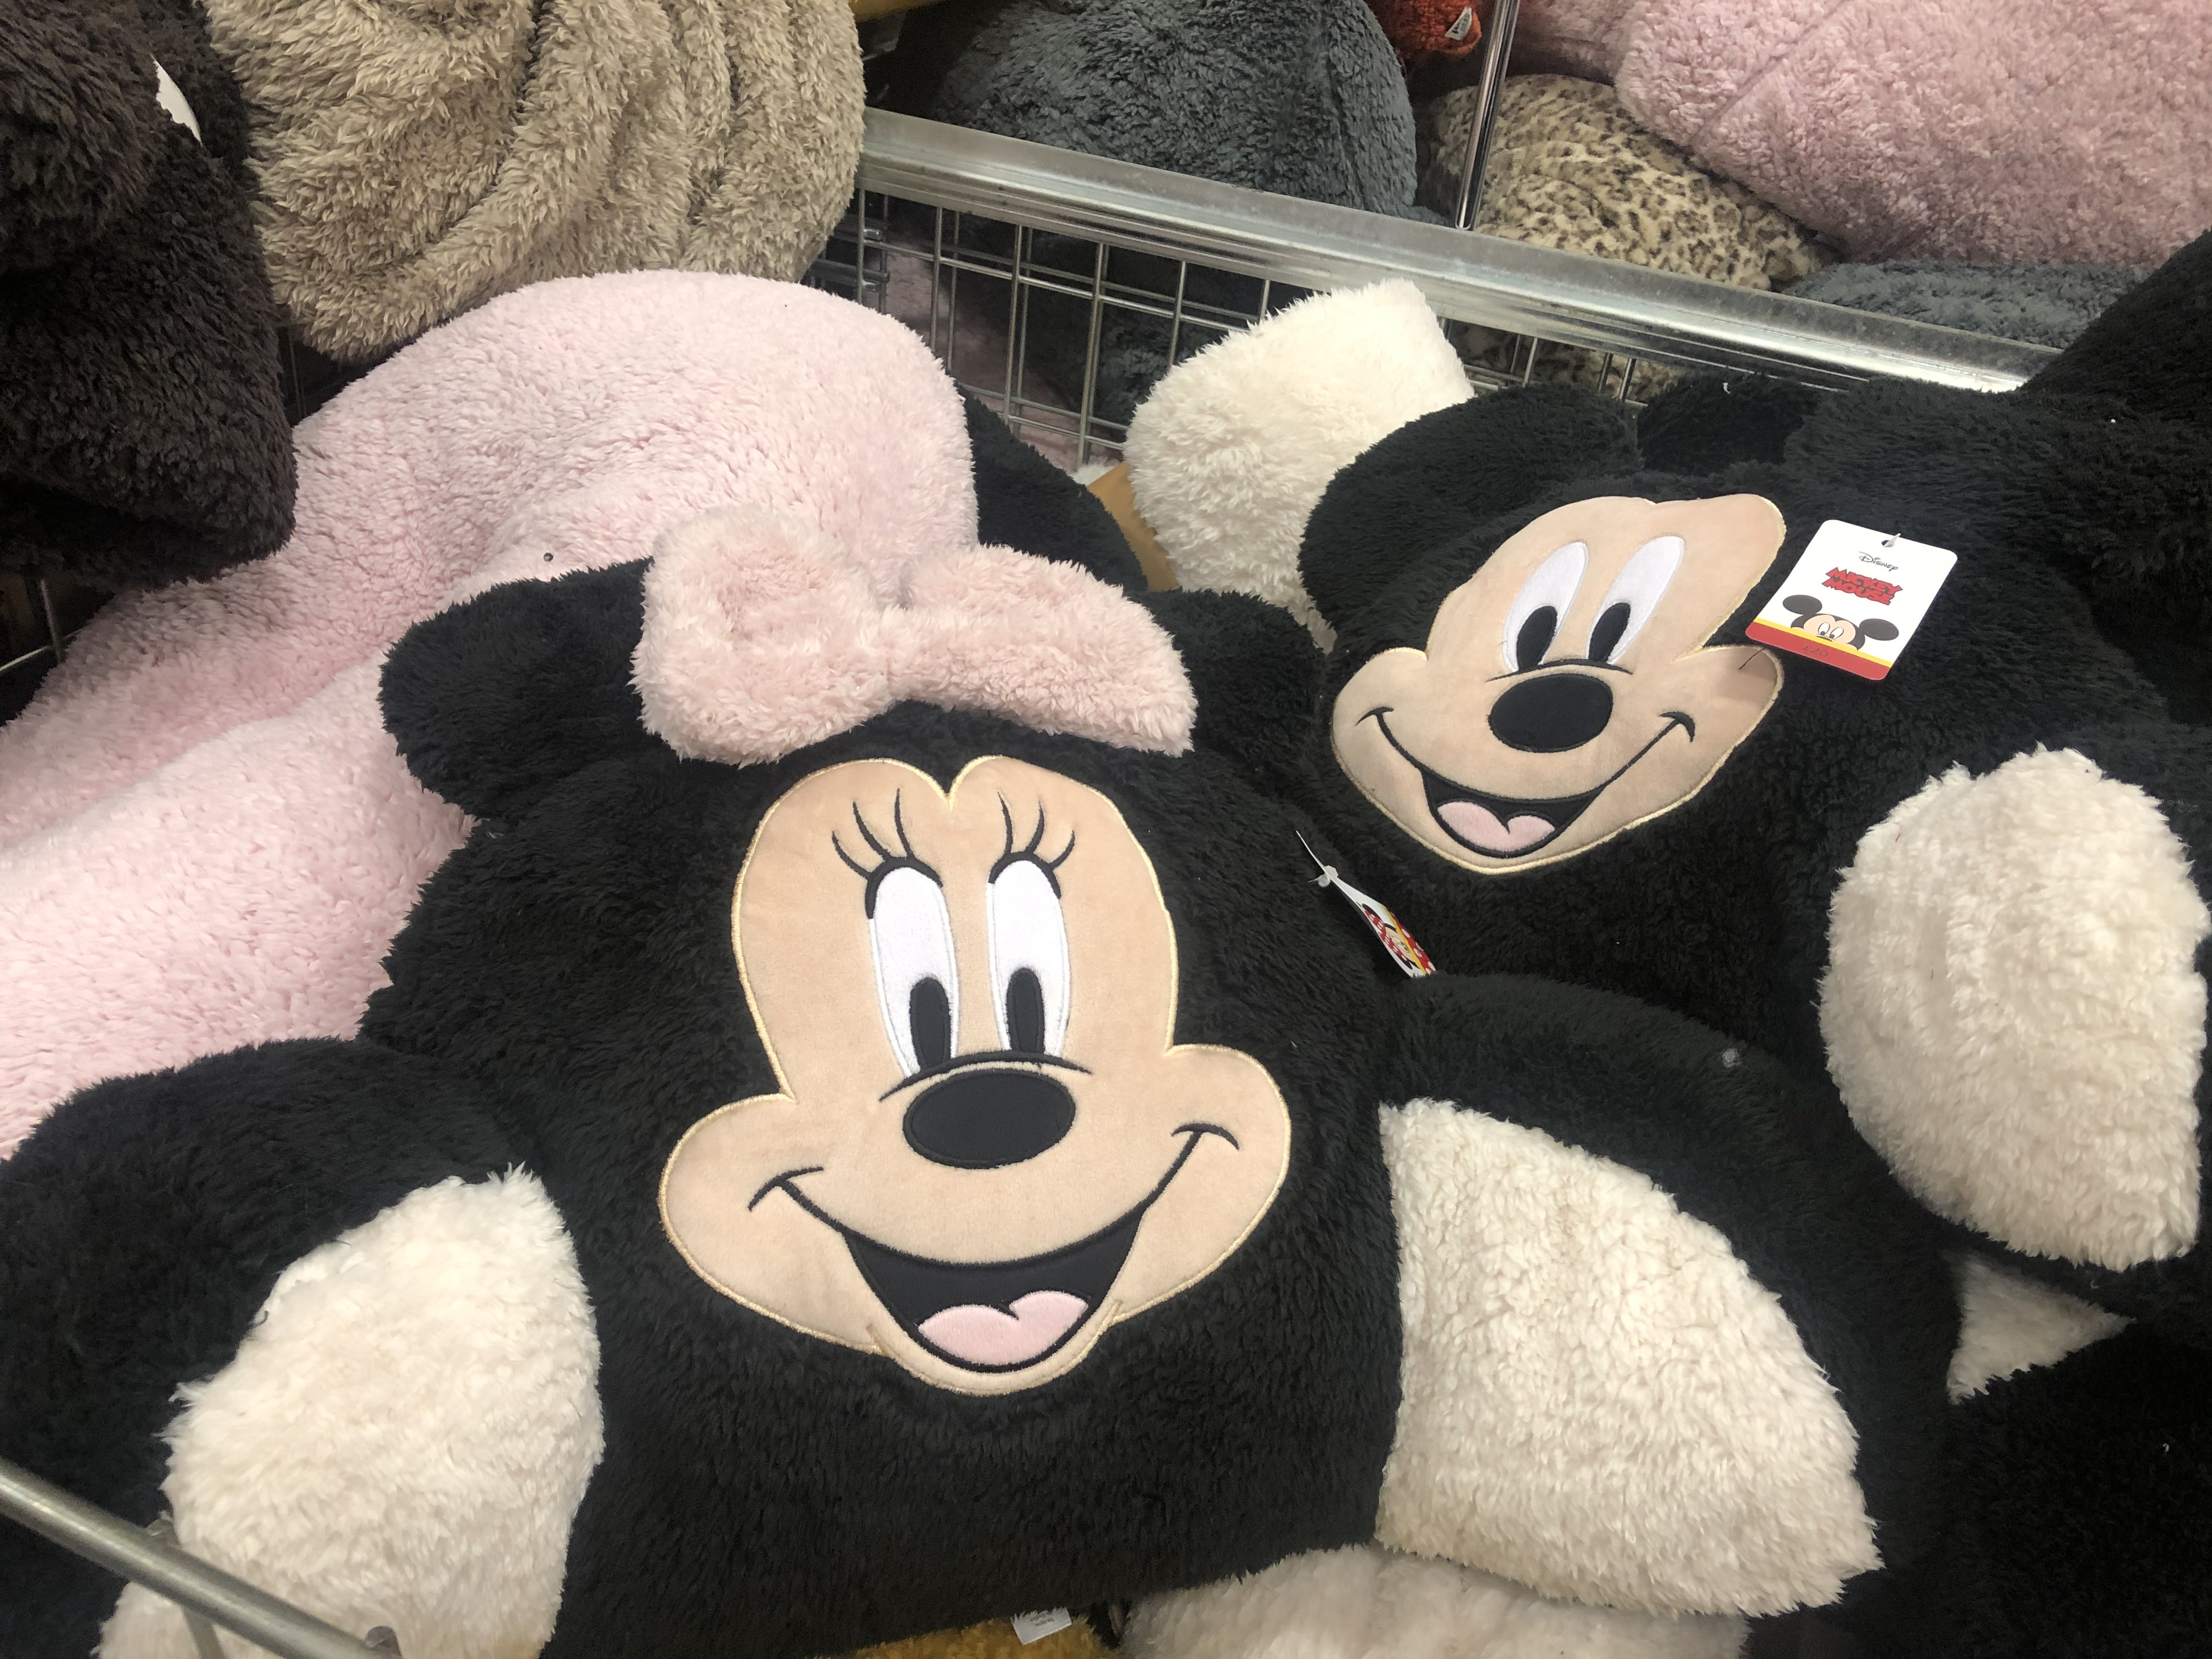 dunelm is selling disney teddy fleece